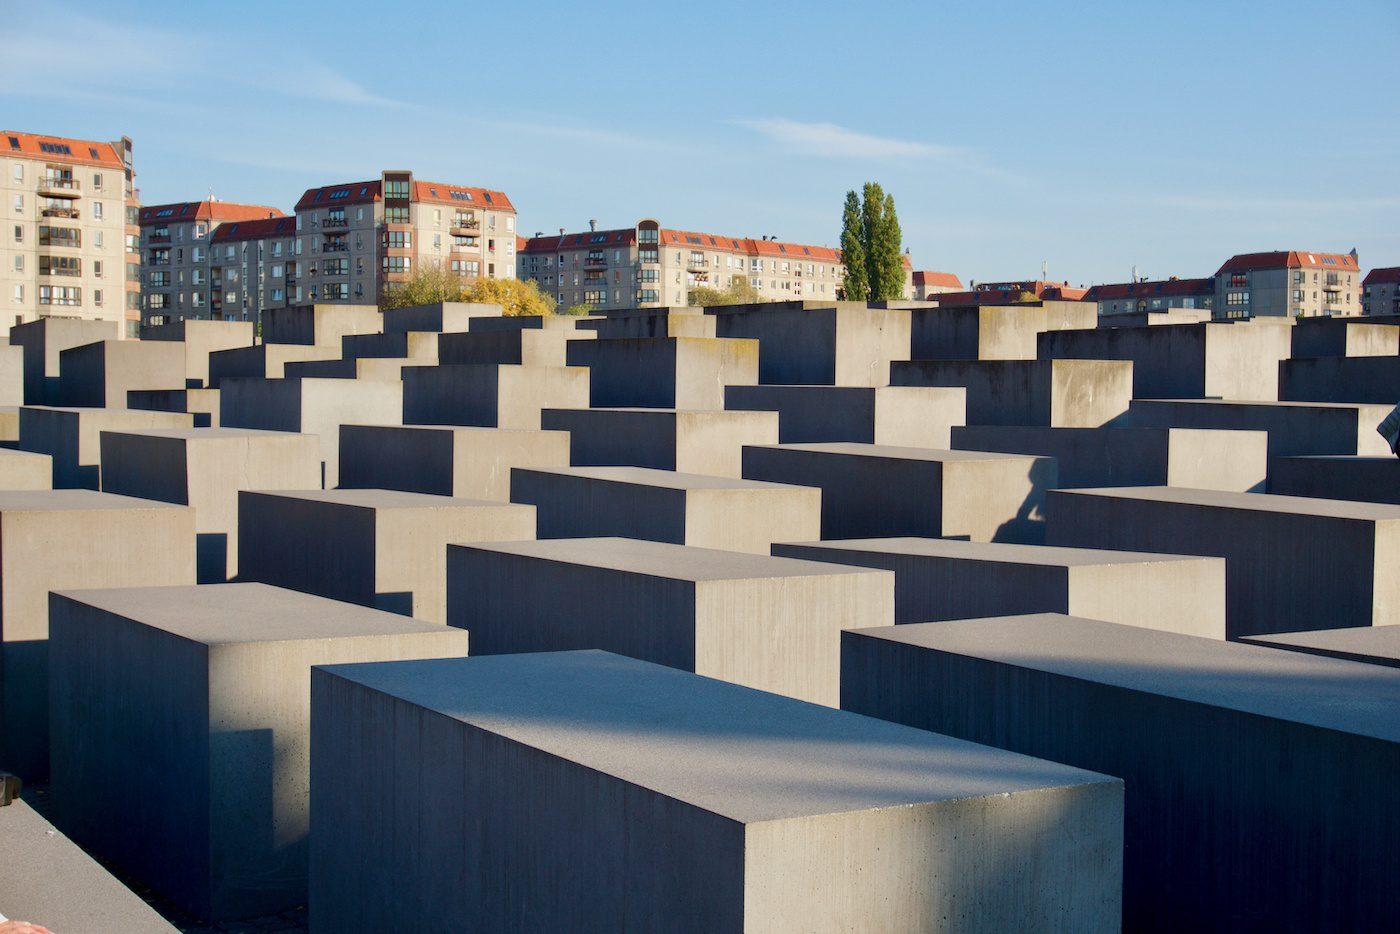 The Holocaust memorial in Berlin, Germany.